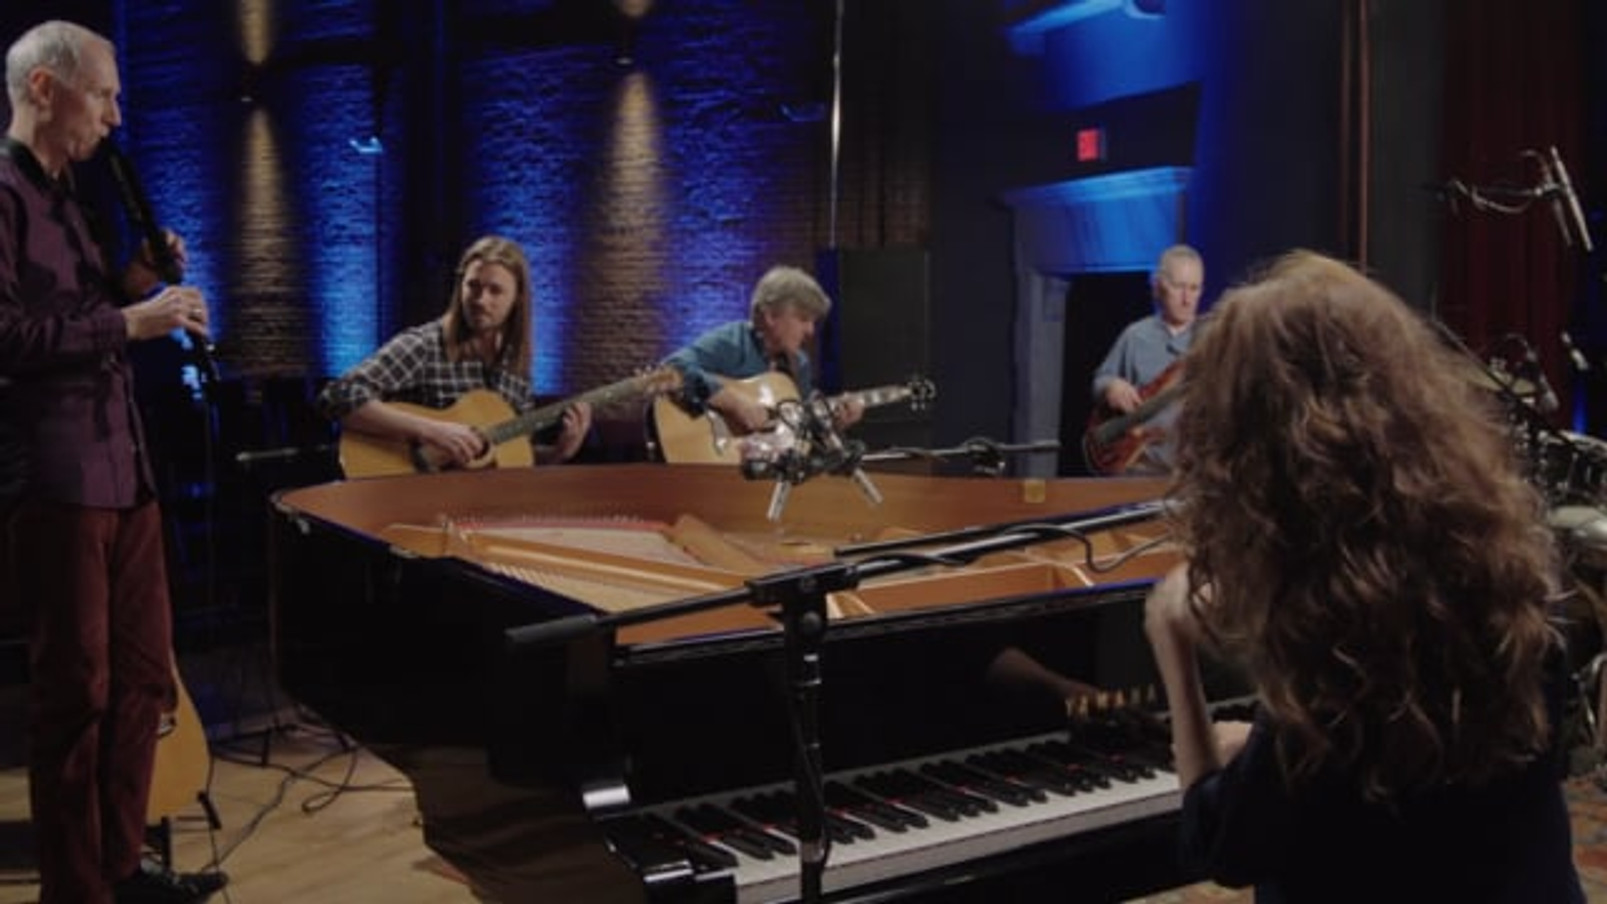 Todd Mosby and The New Horizon Ensemble   Moon Song